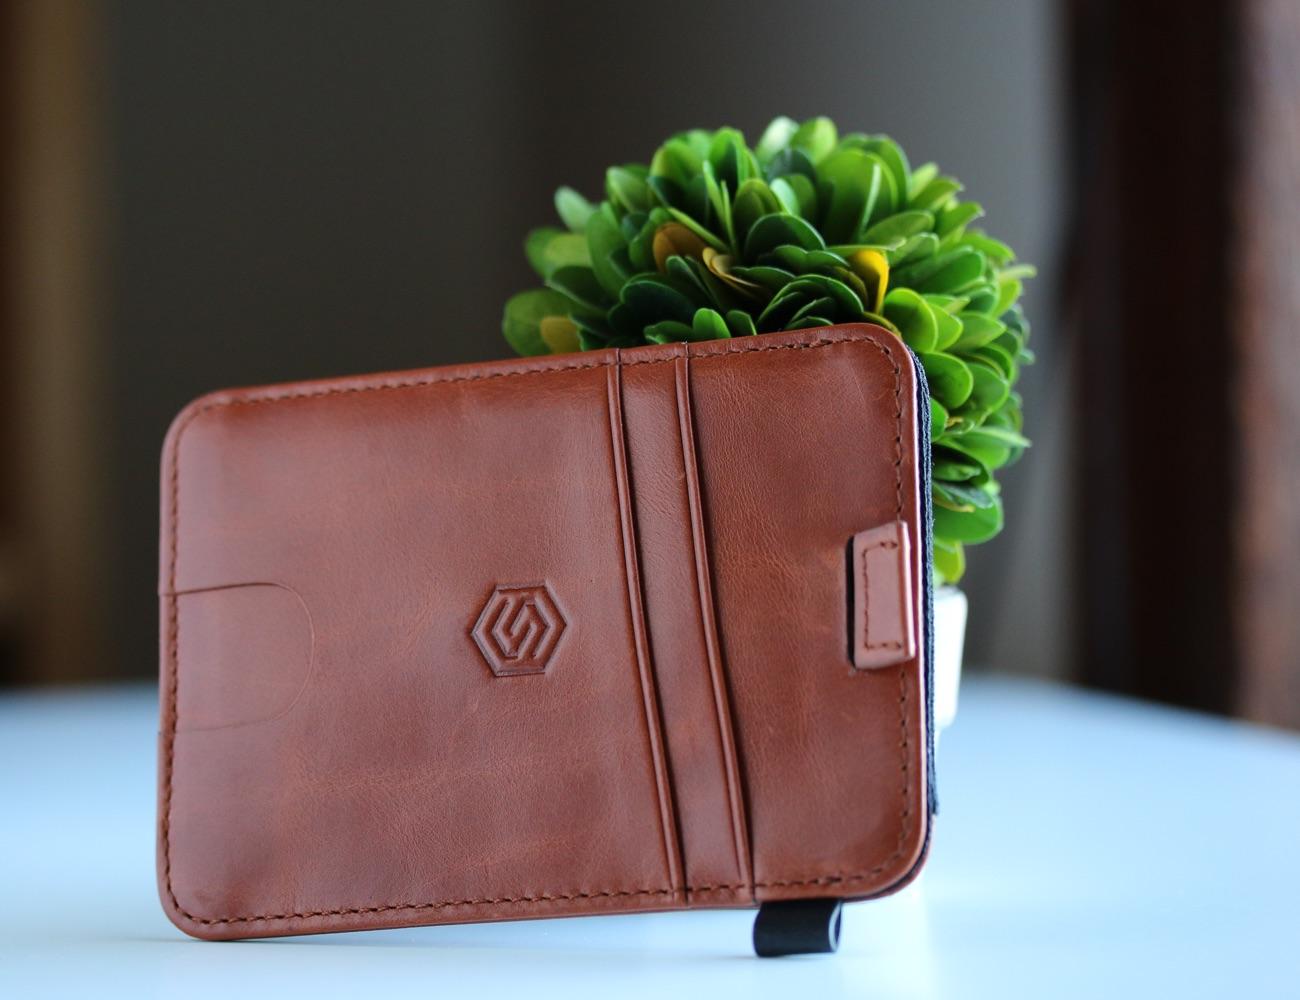 STRAPO Expandable Minimalist Wallet